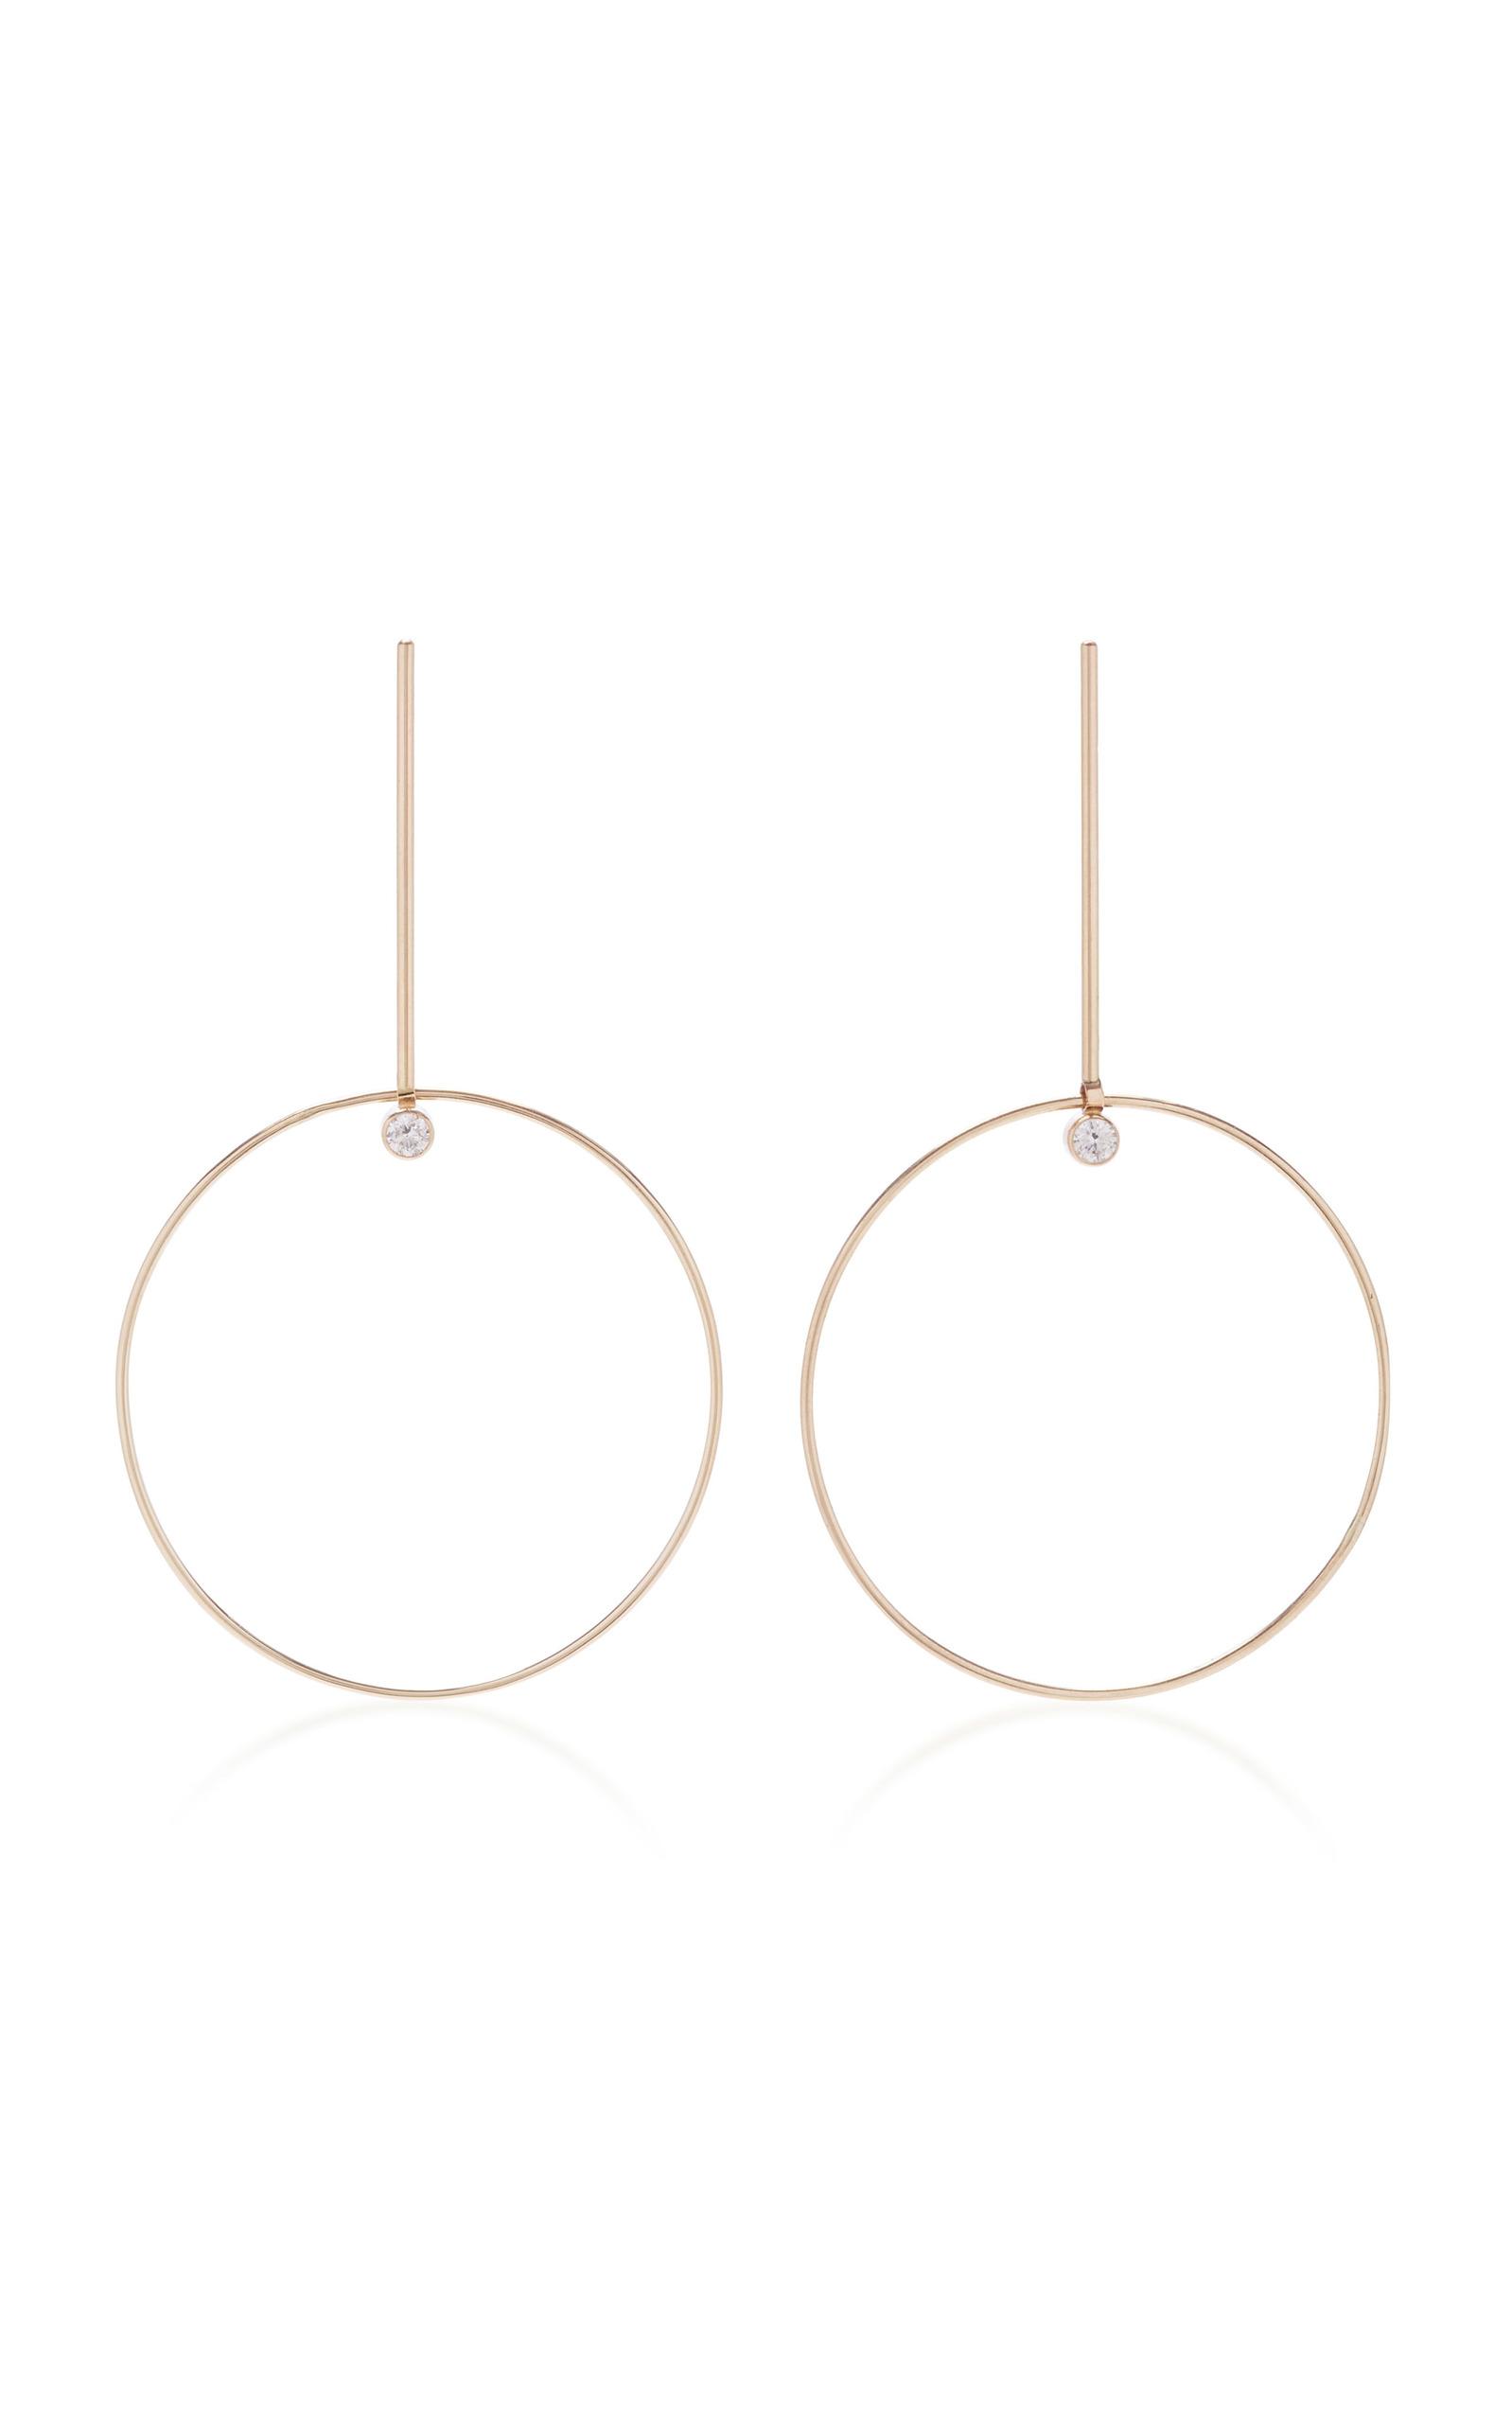 WHITE/SPACE SEZIO 14K GOLD DIAMOND EARRINGS